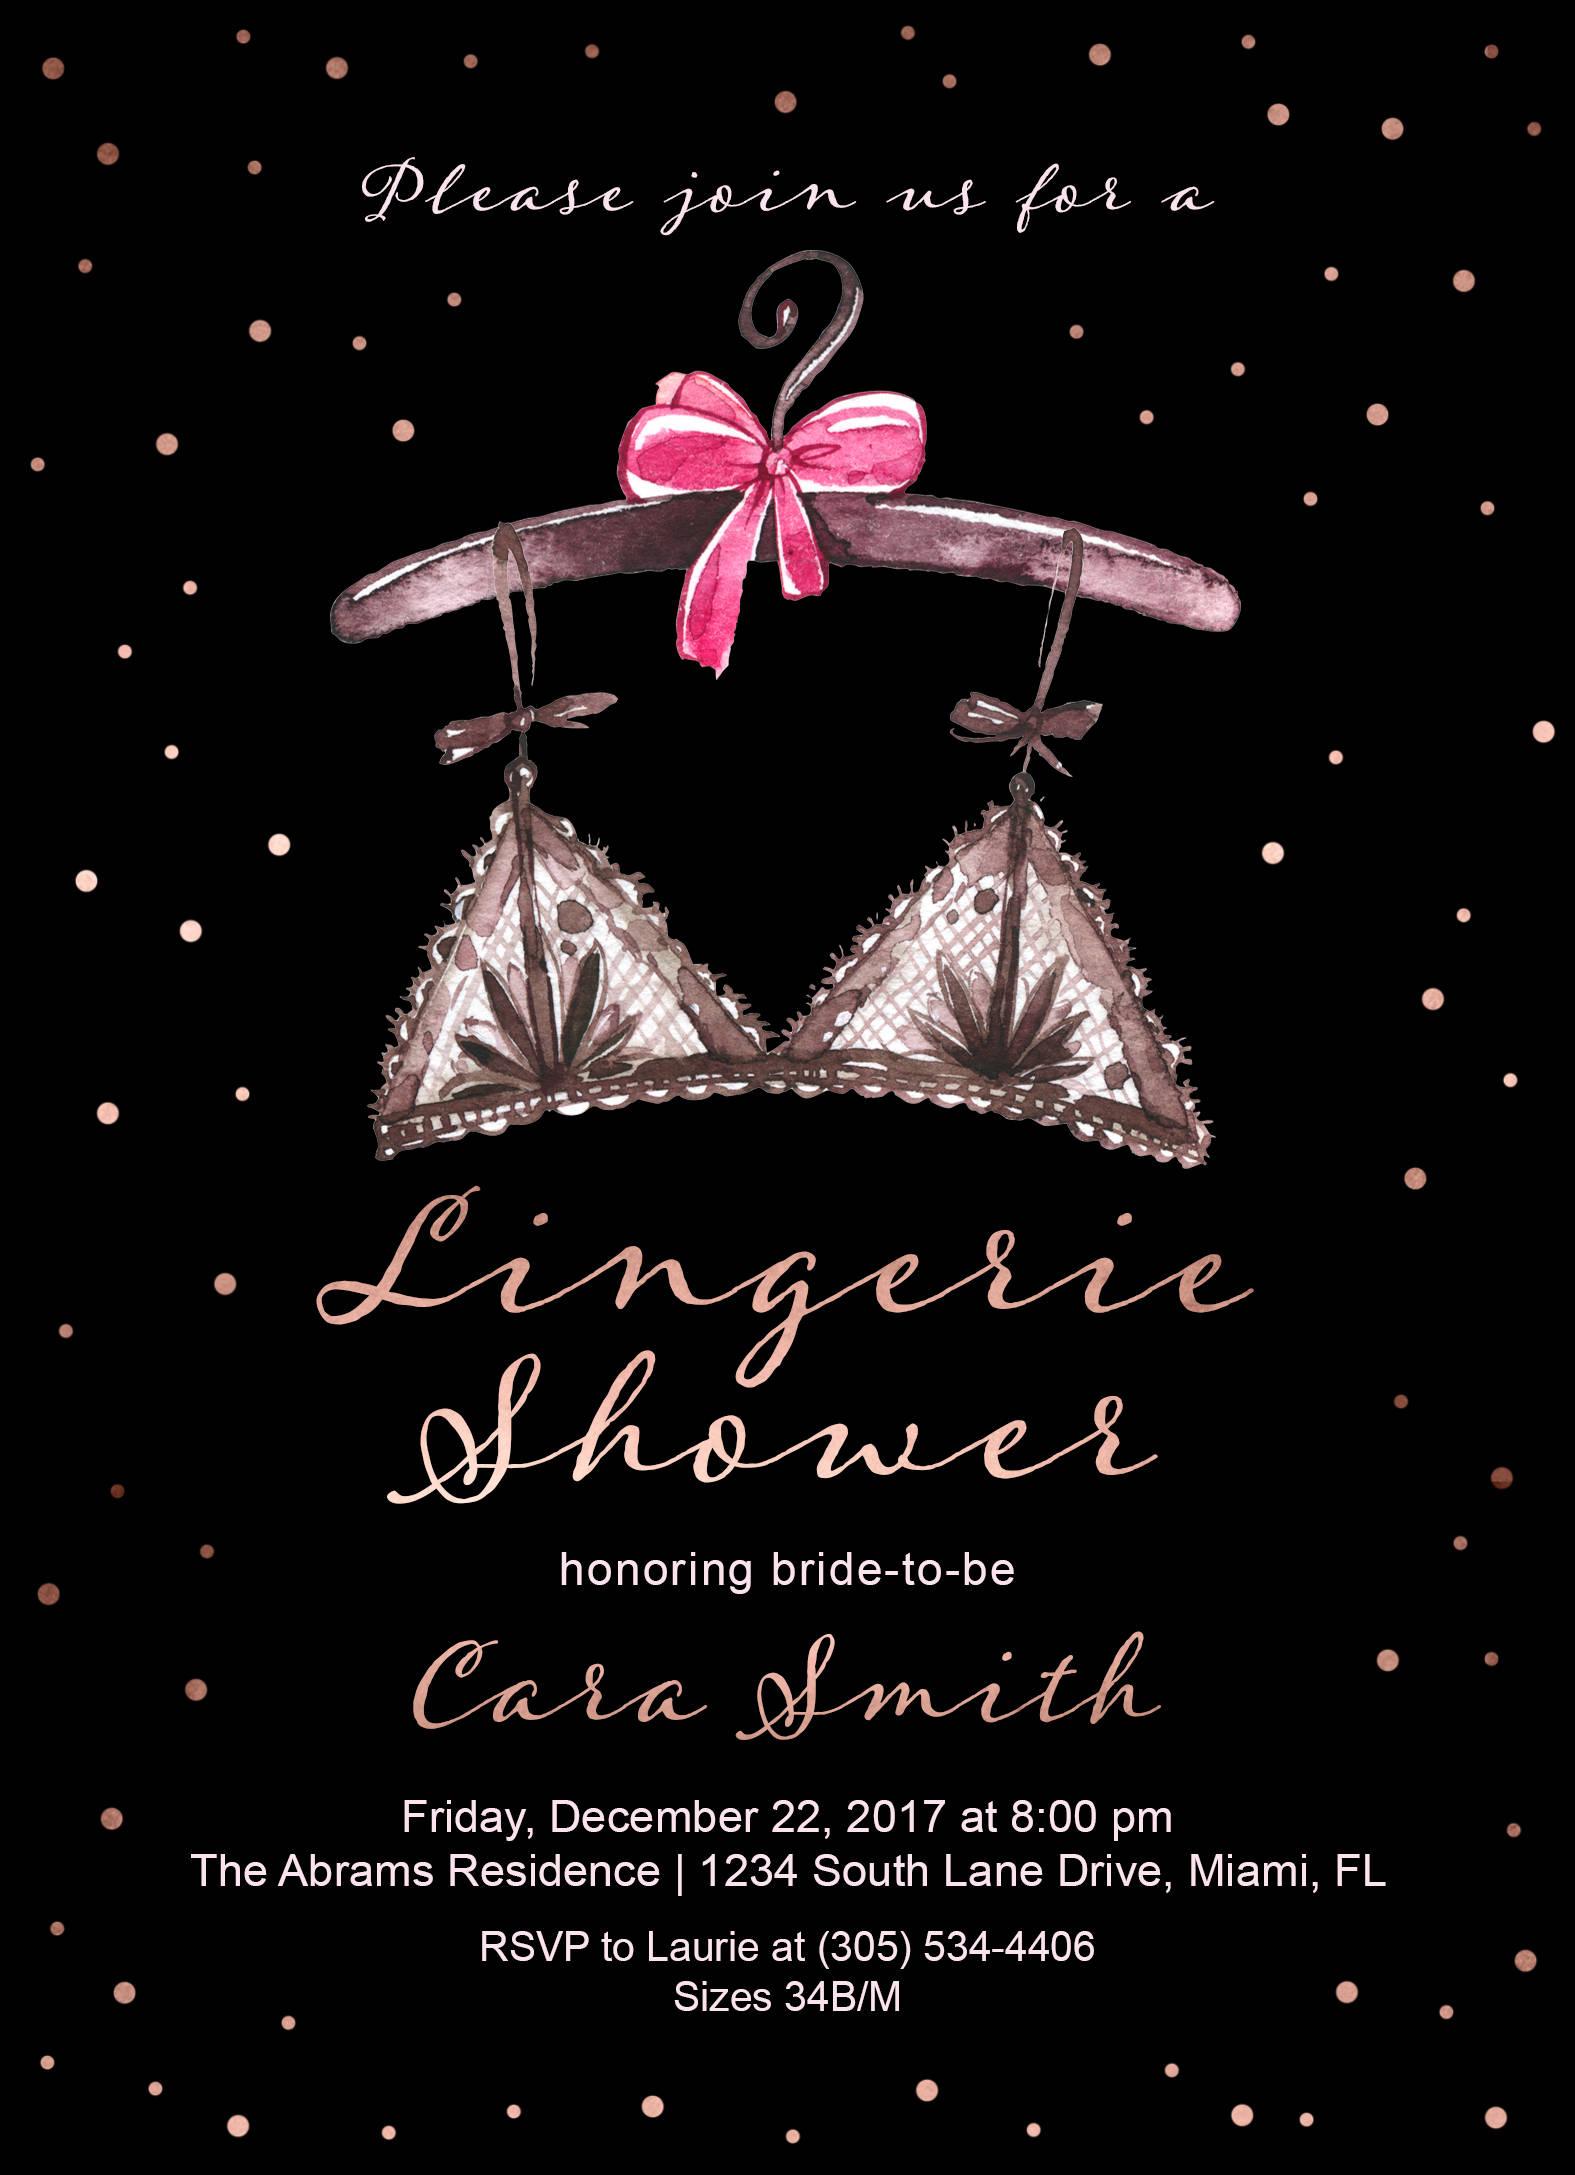 lingerie shower invitation lingerie bridal shower invitation rose gold bridal shower invitation ooh la la lingerie shower printable